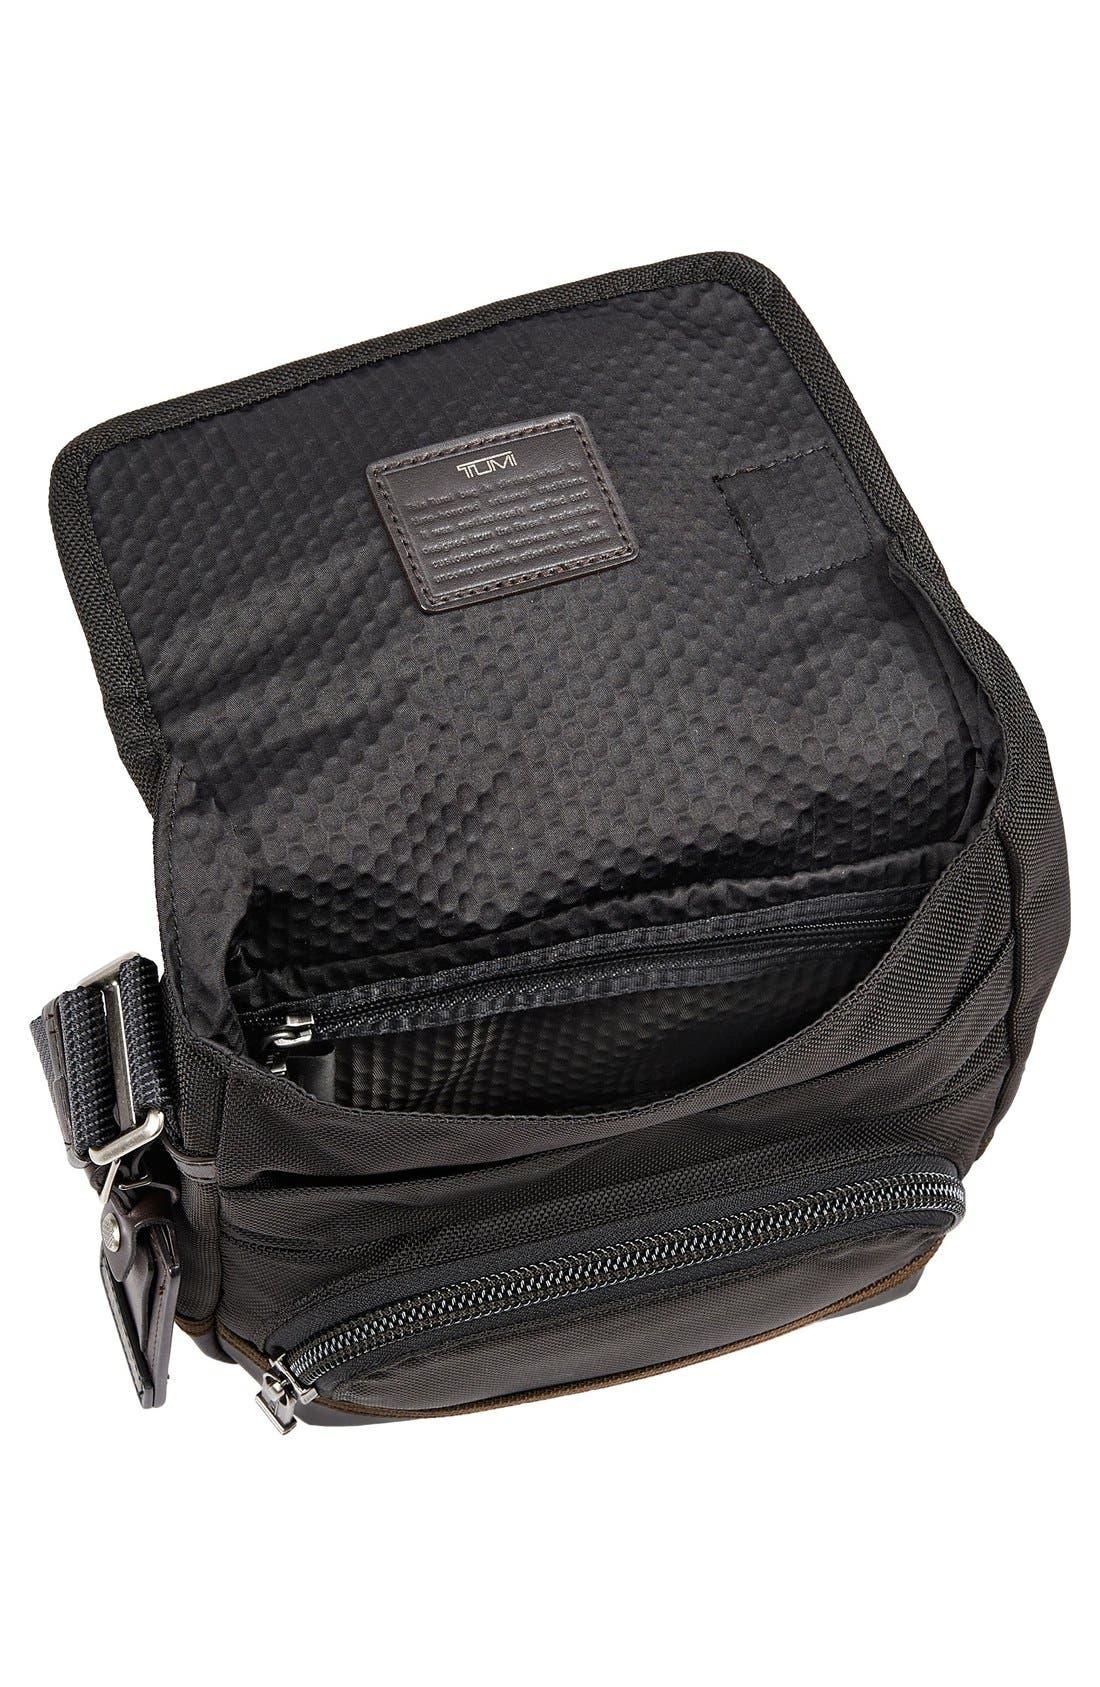 'Alpha Bravo - Barstow' Crossbody Bag,                             Alternate thumbnail 4, color,                             Hickory Black